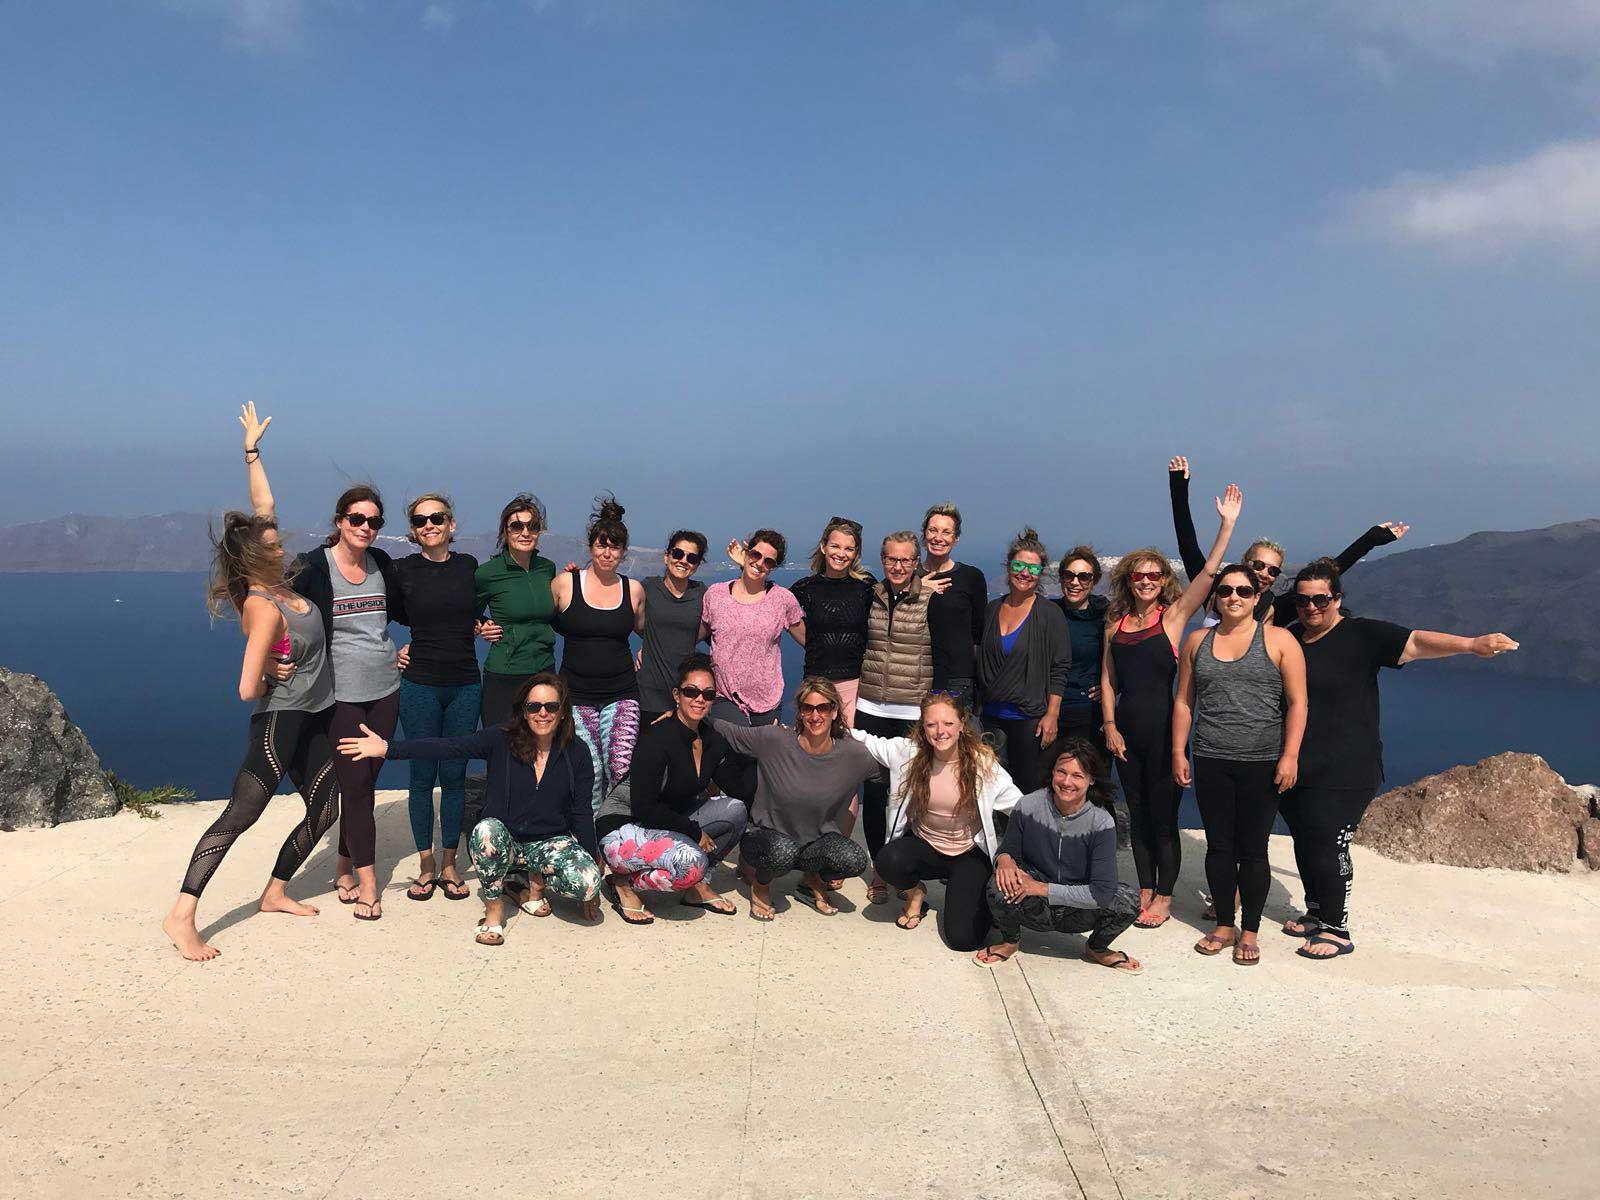 Santorini Whole Self Retreat 2018 - the group